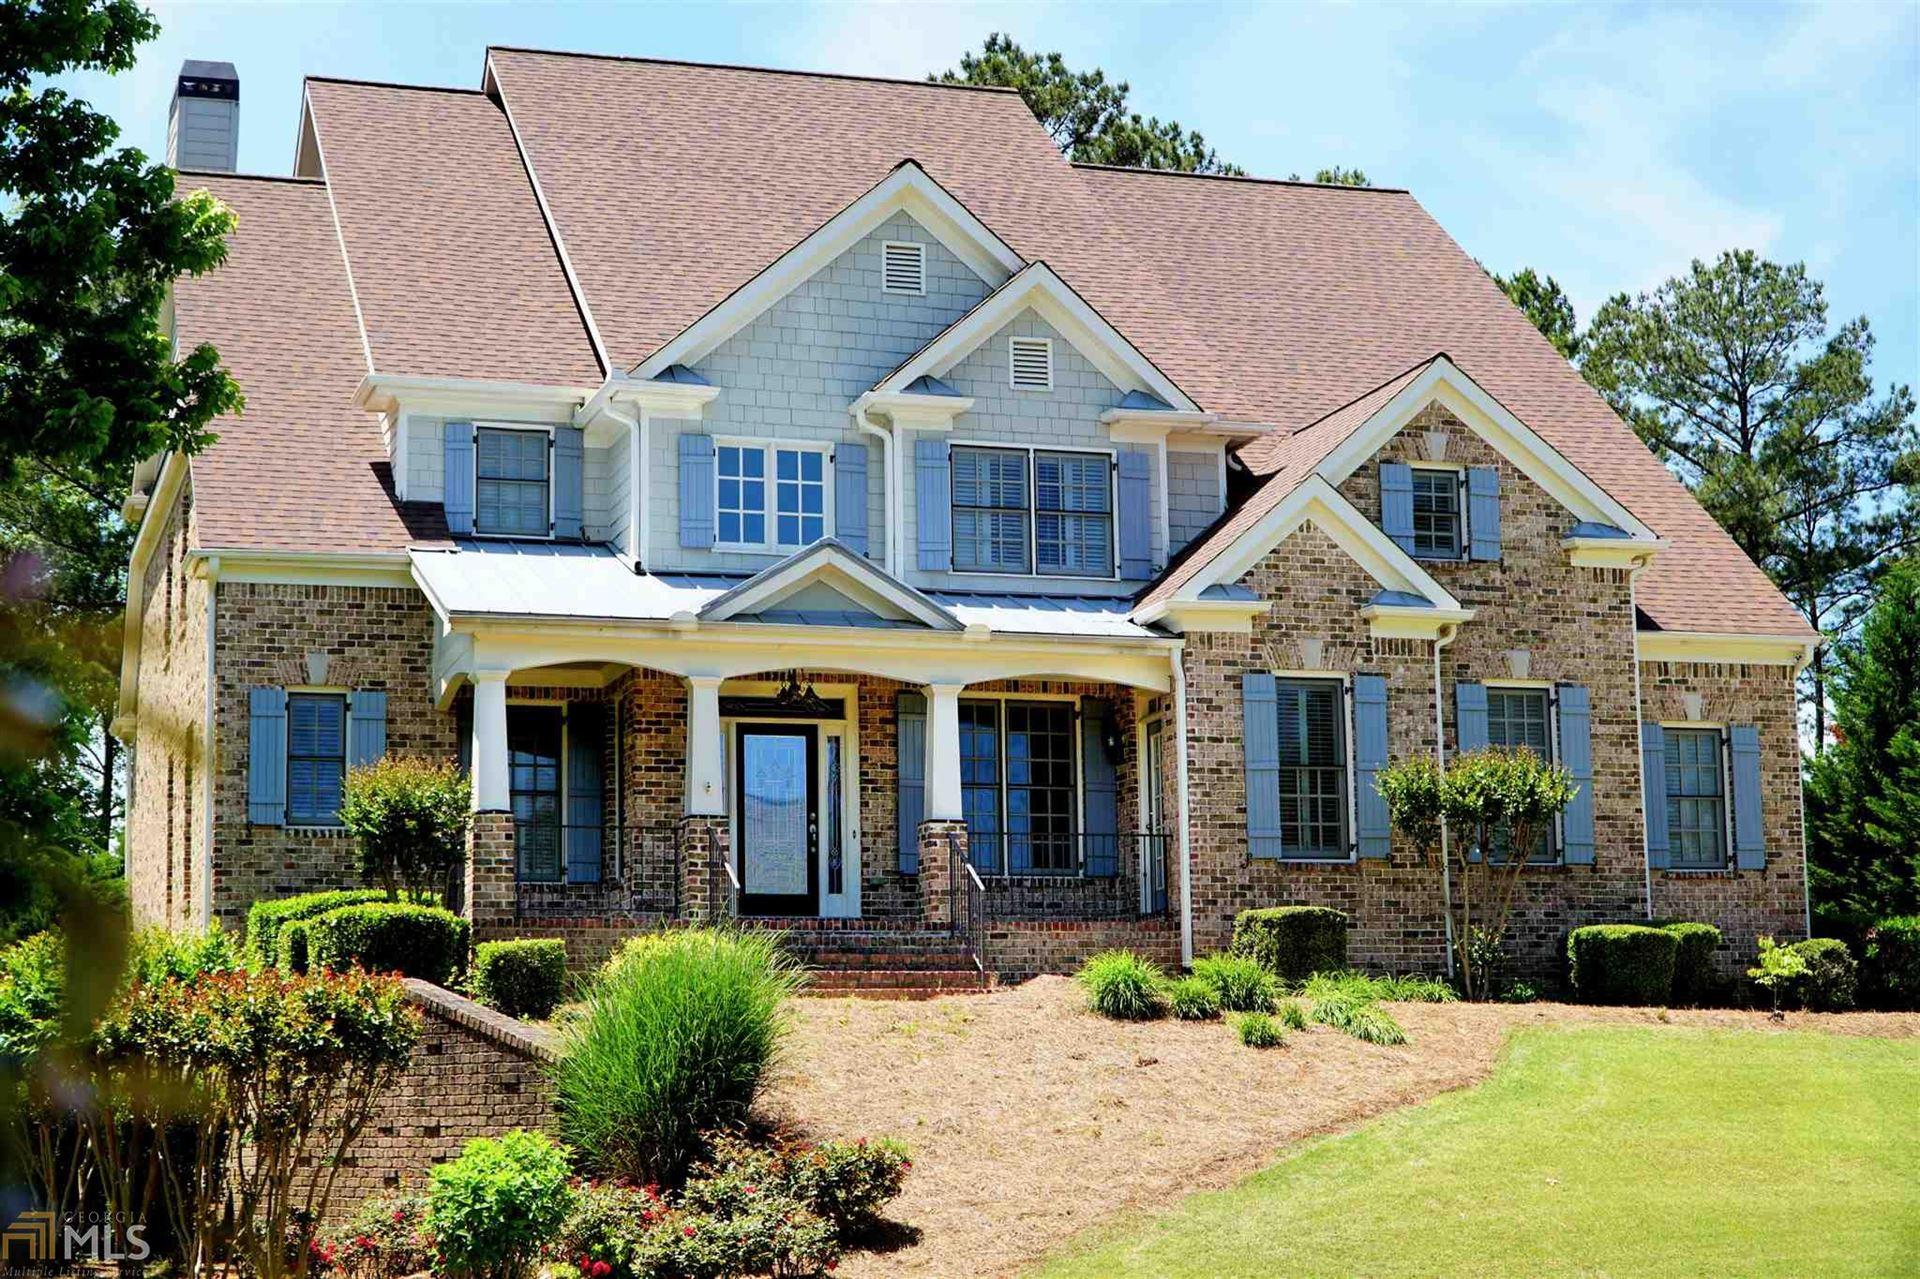 143 Cedar Woods, Canton, GA 30114 - MLS#: 8784904